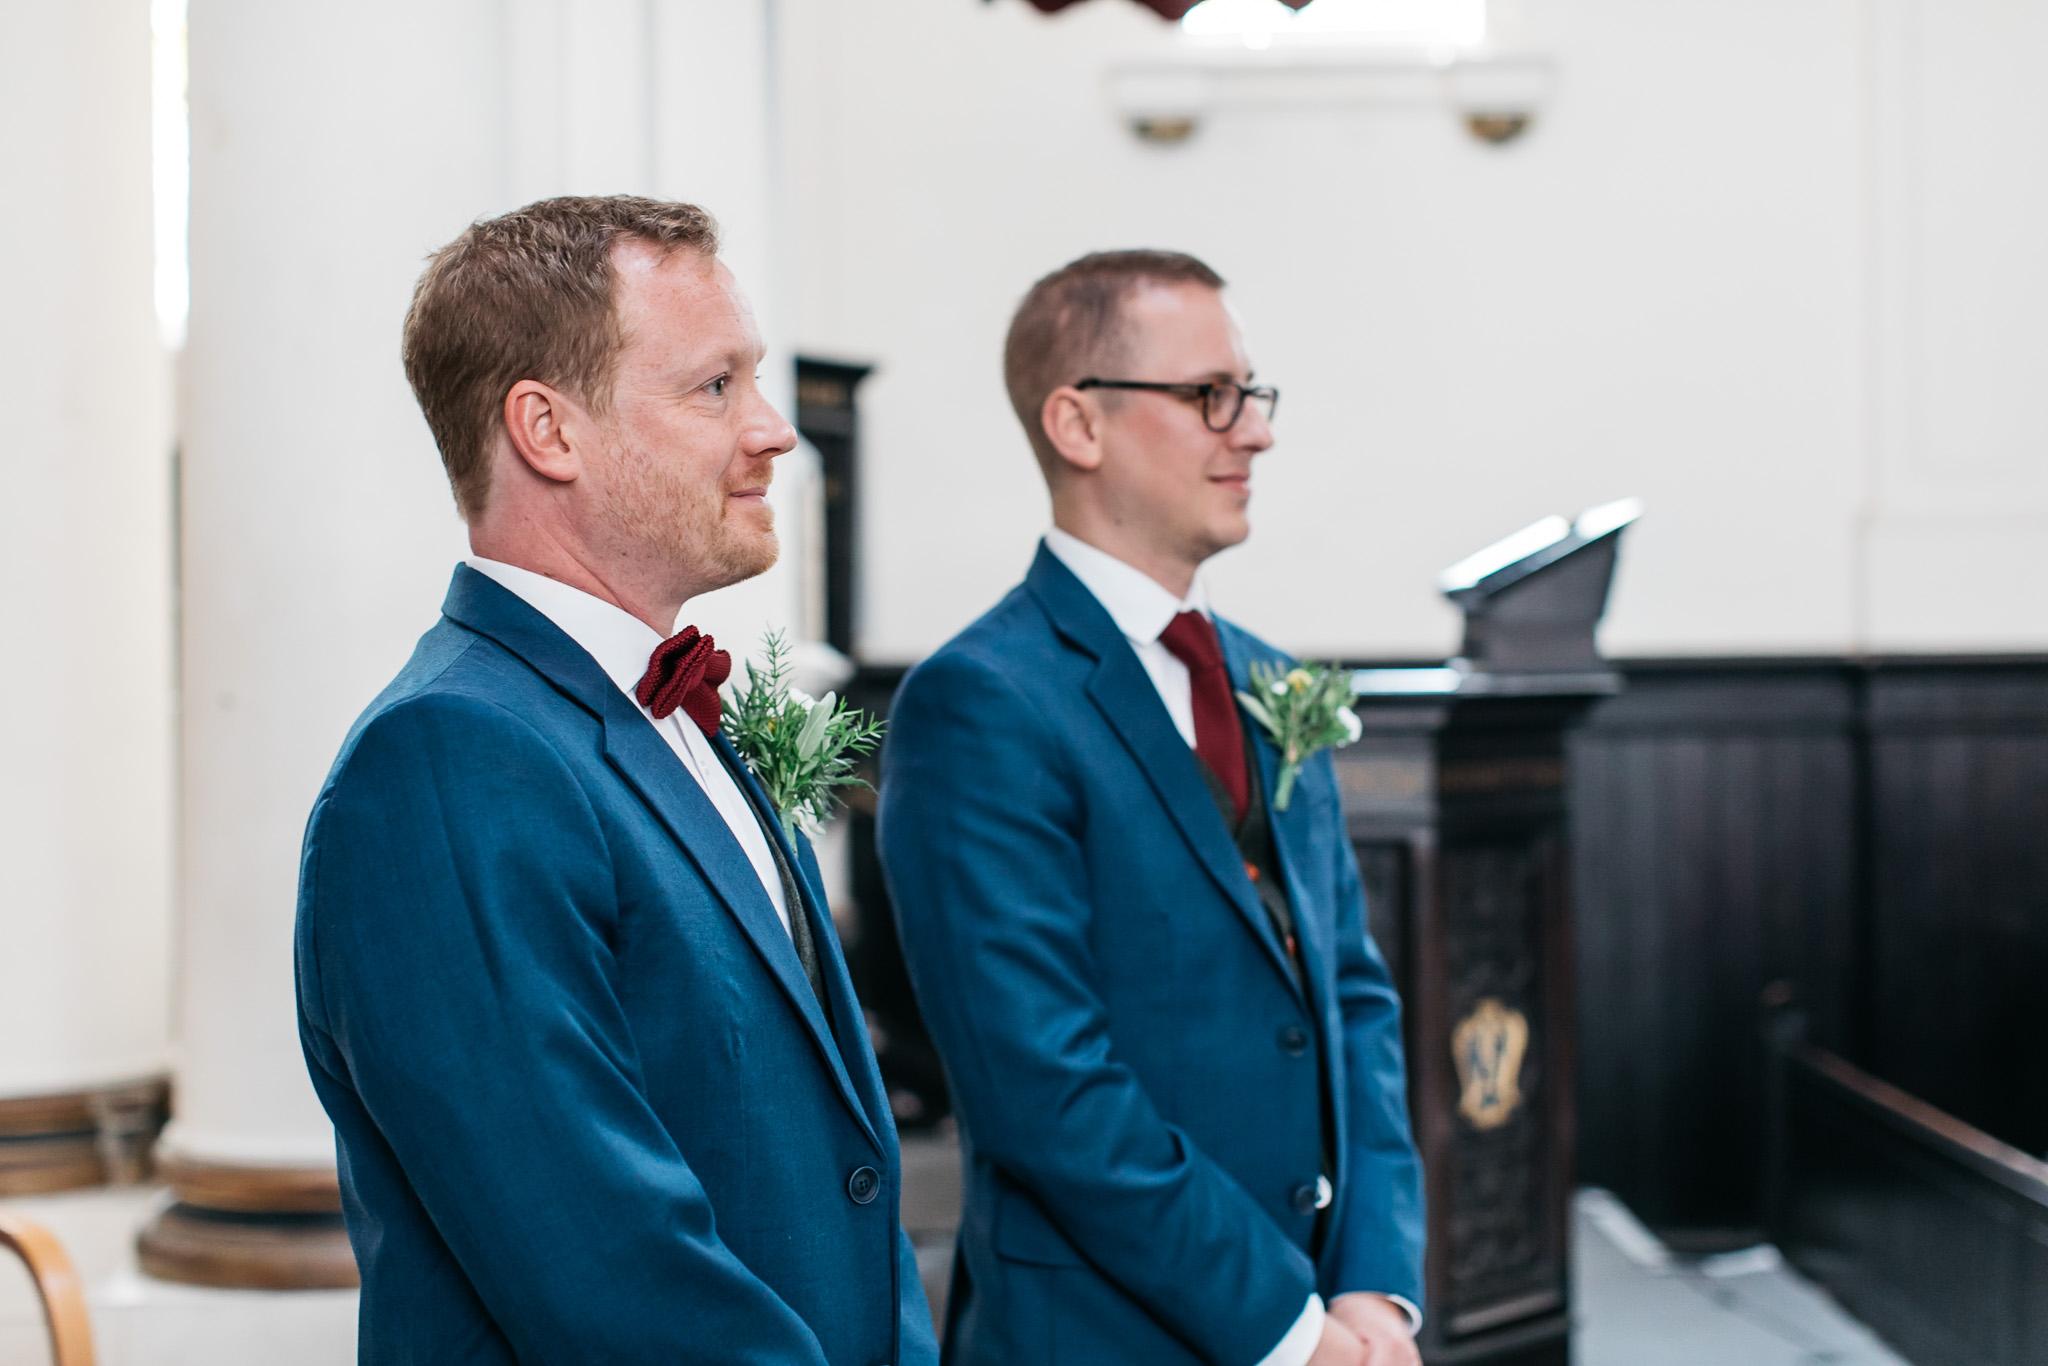 st_andrews_fabrica_brighton_wedding_547.jpg